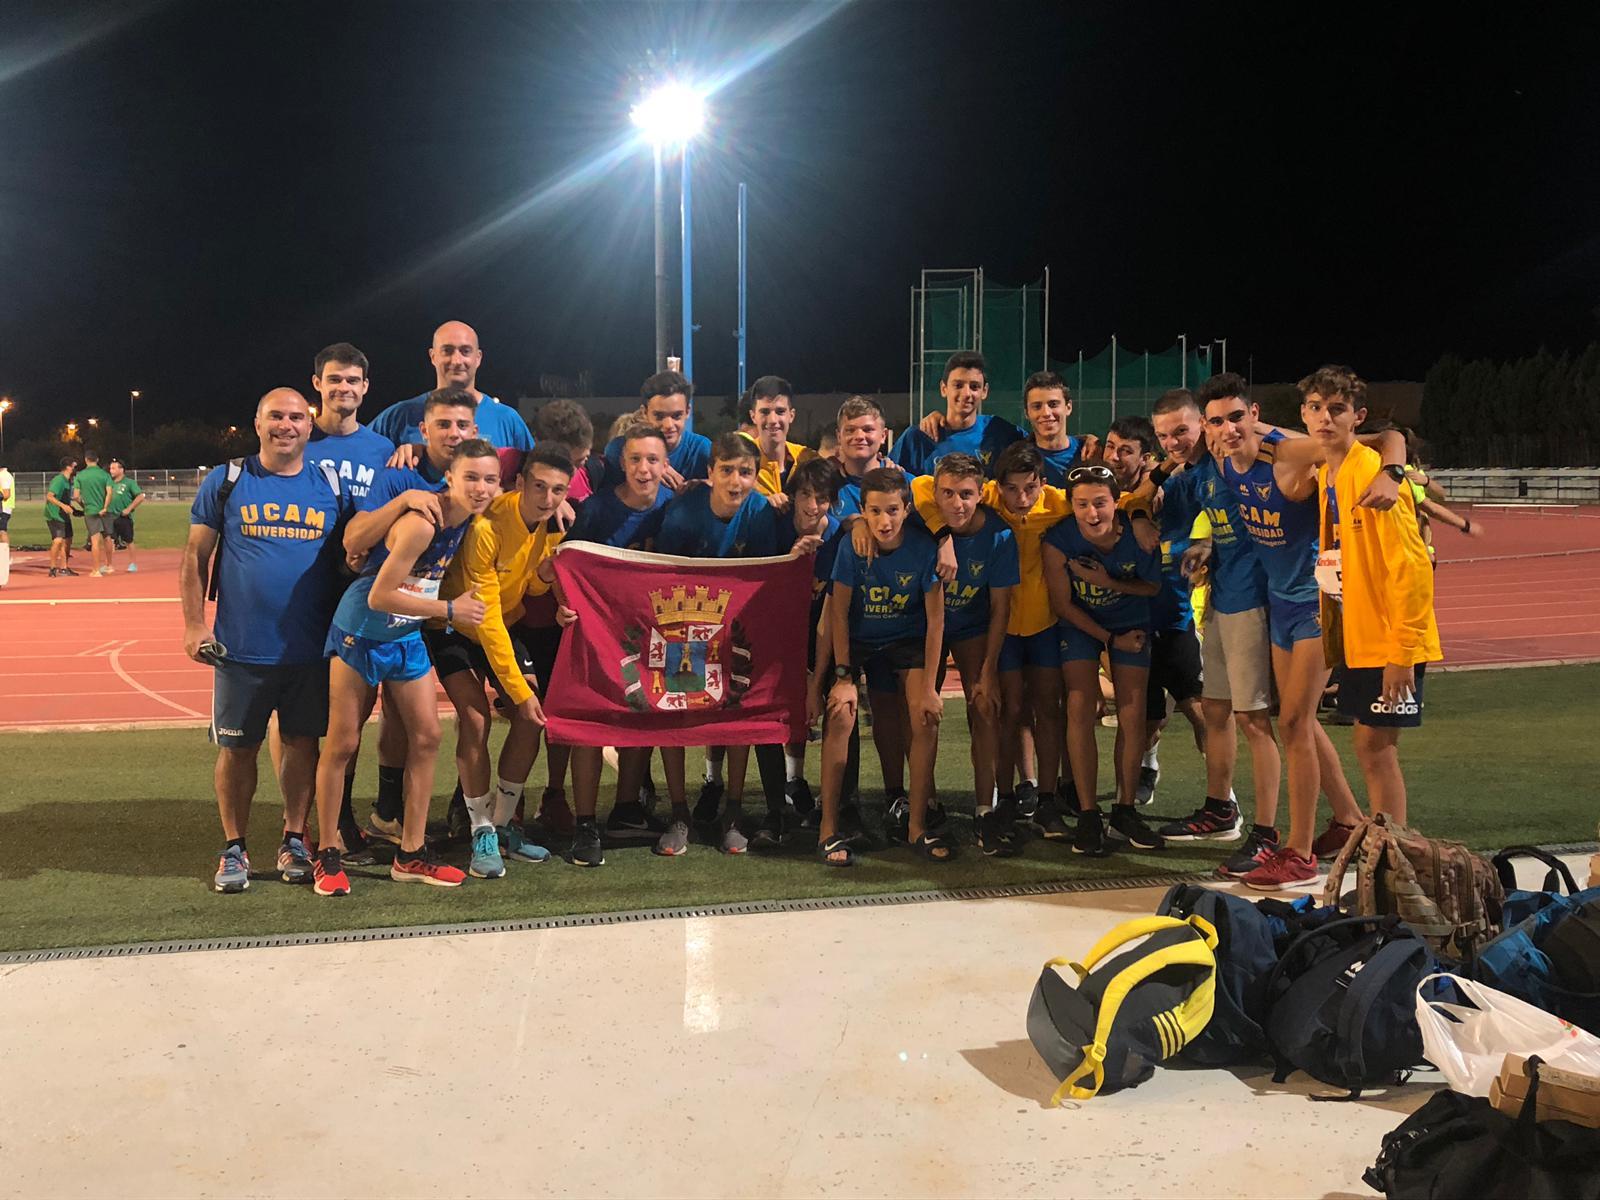 equipo masculino UCAM campeonato españa